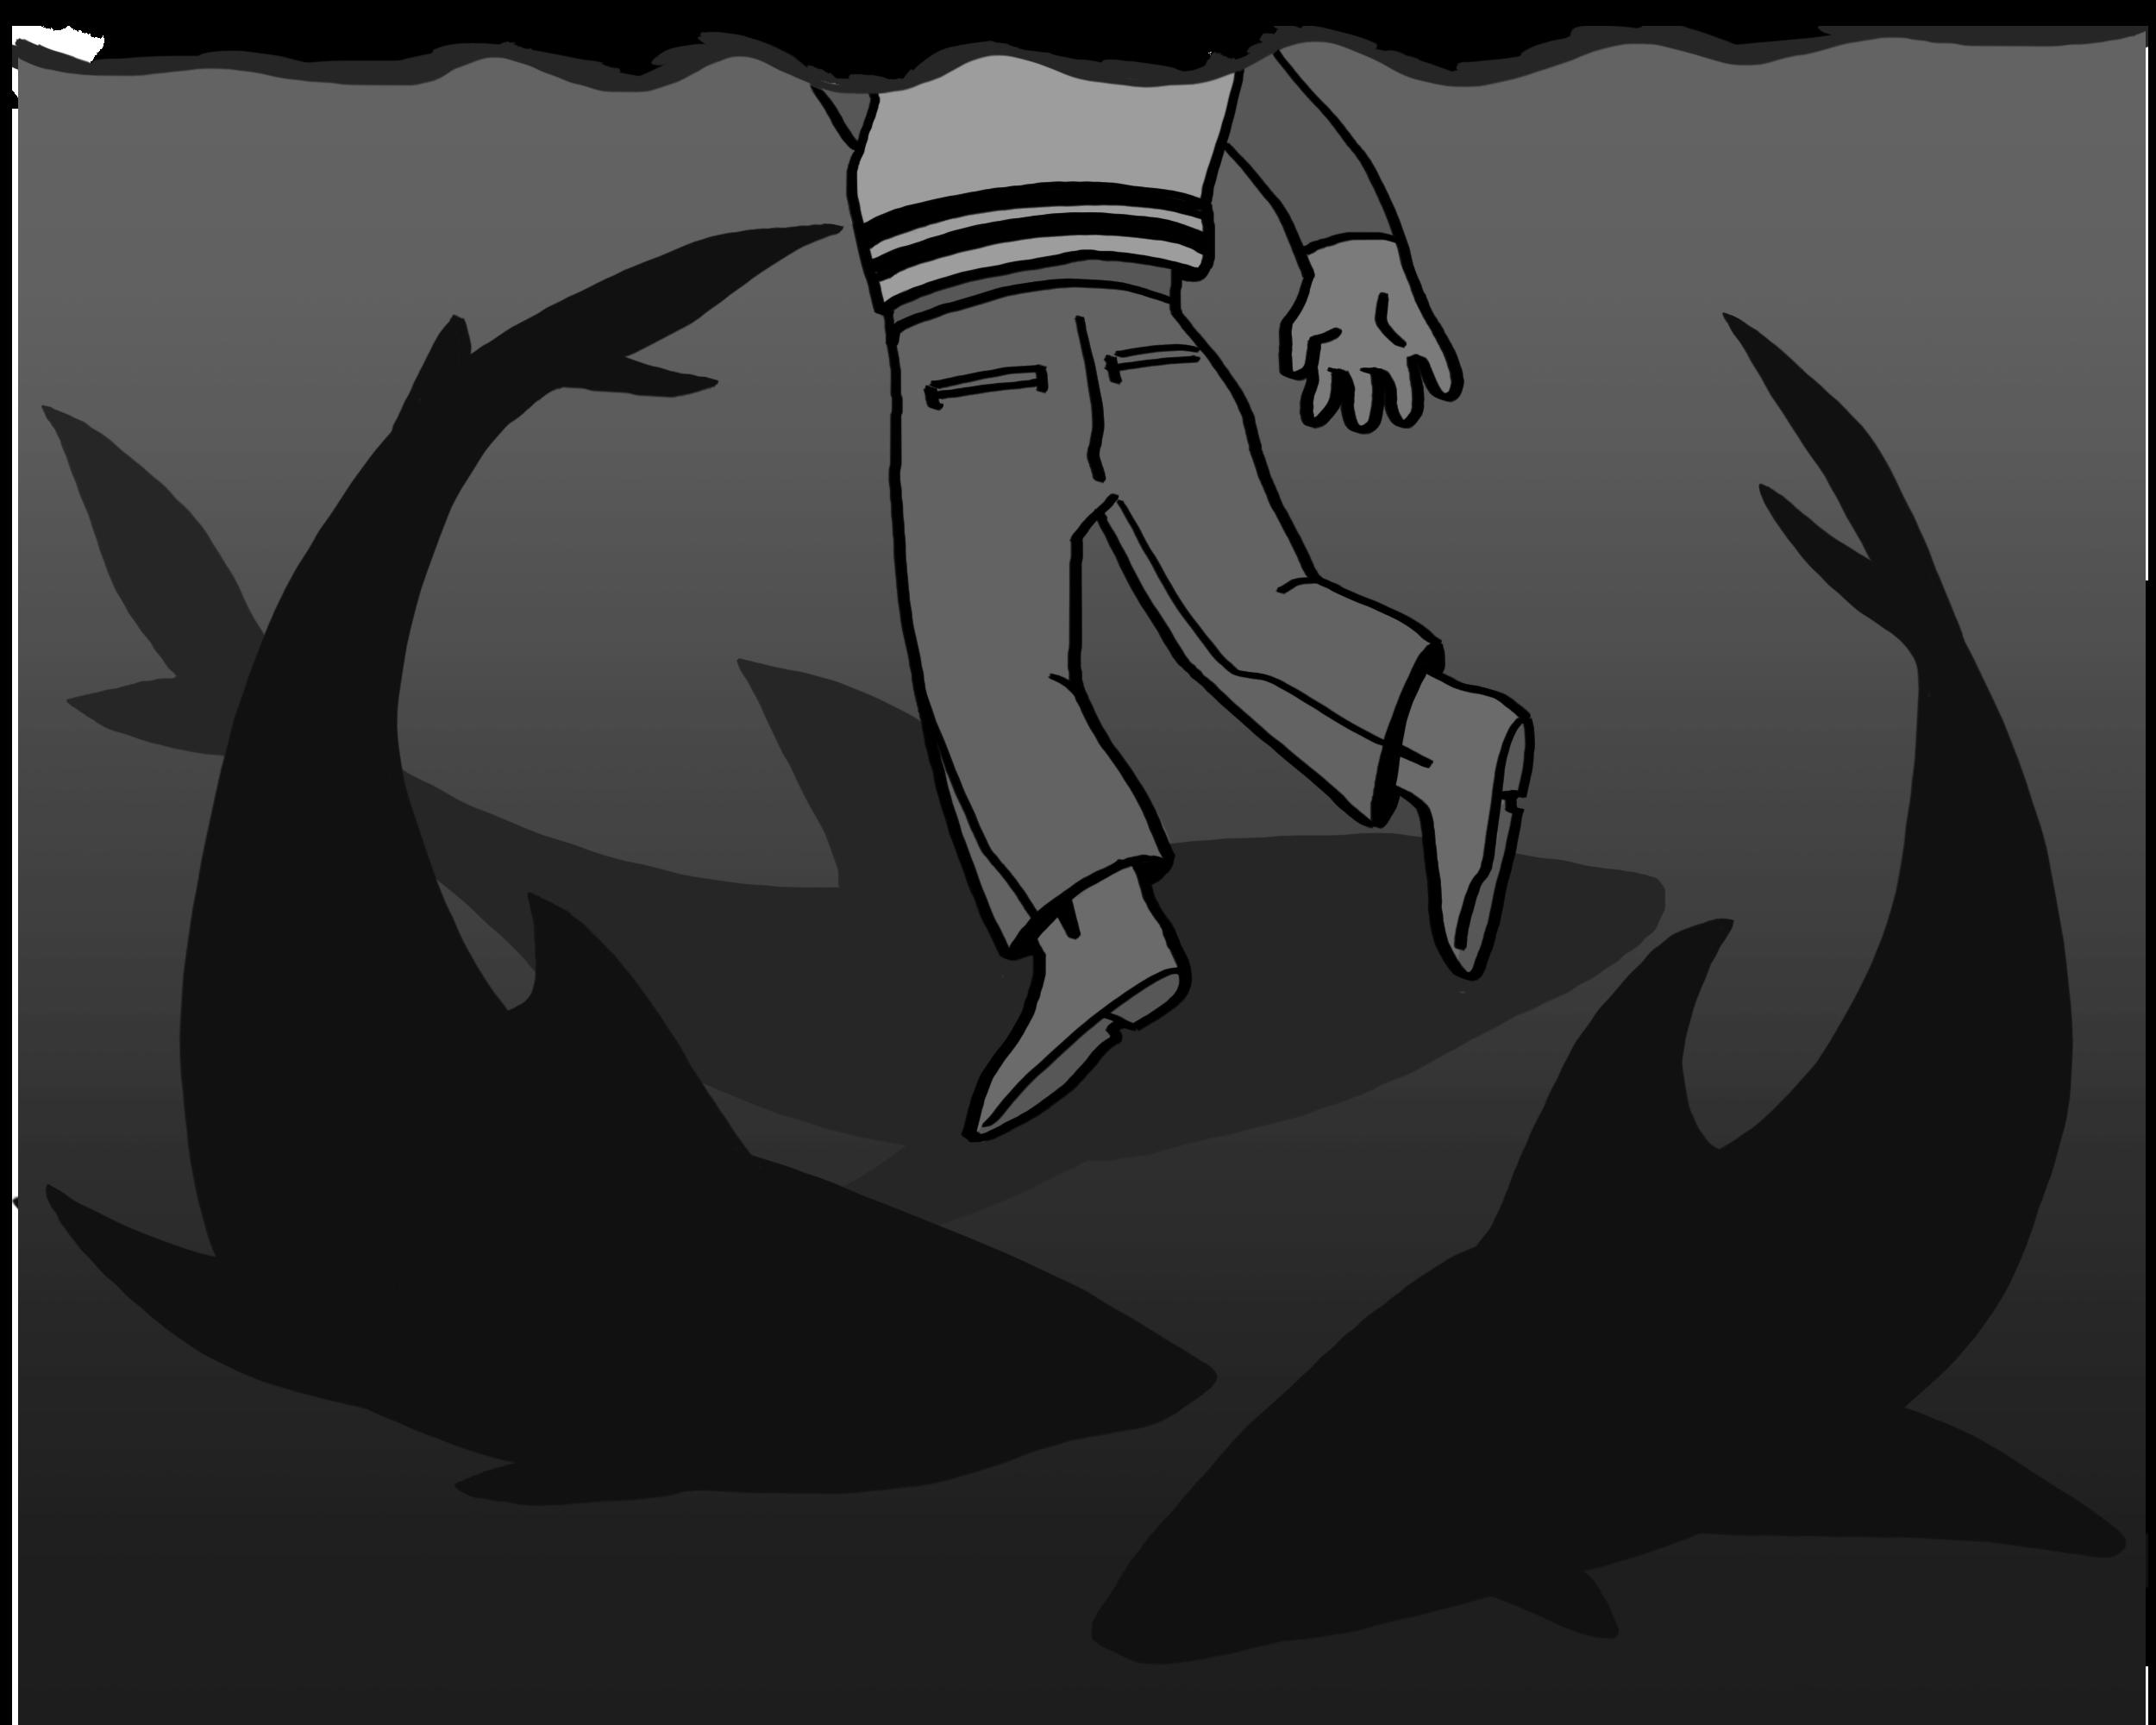 A person shown underwater, with dark shark shapes around them